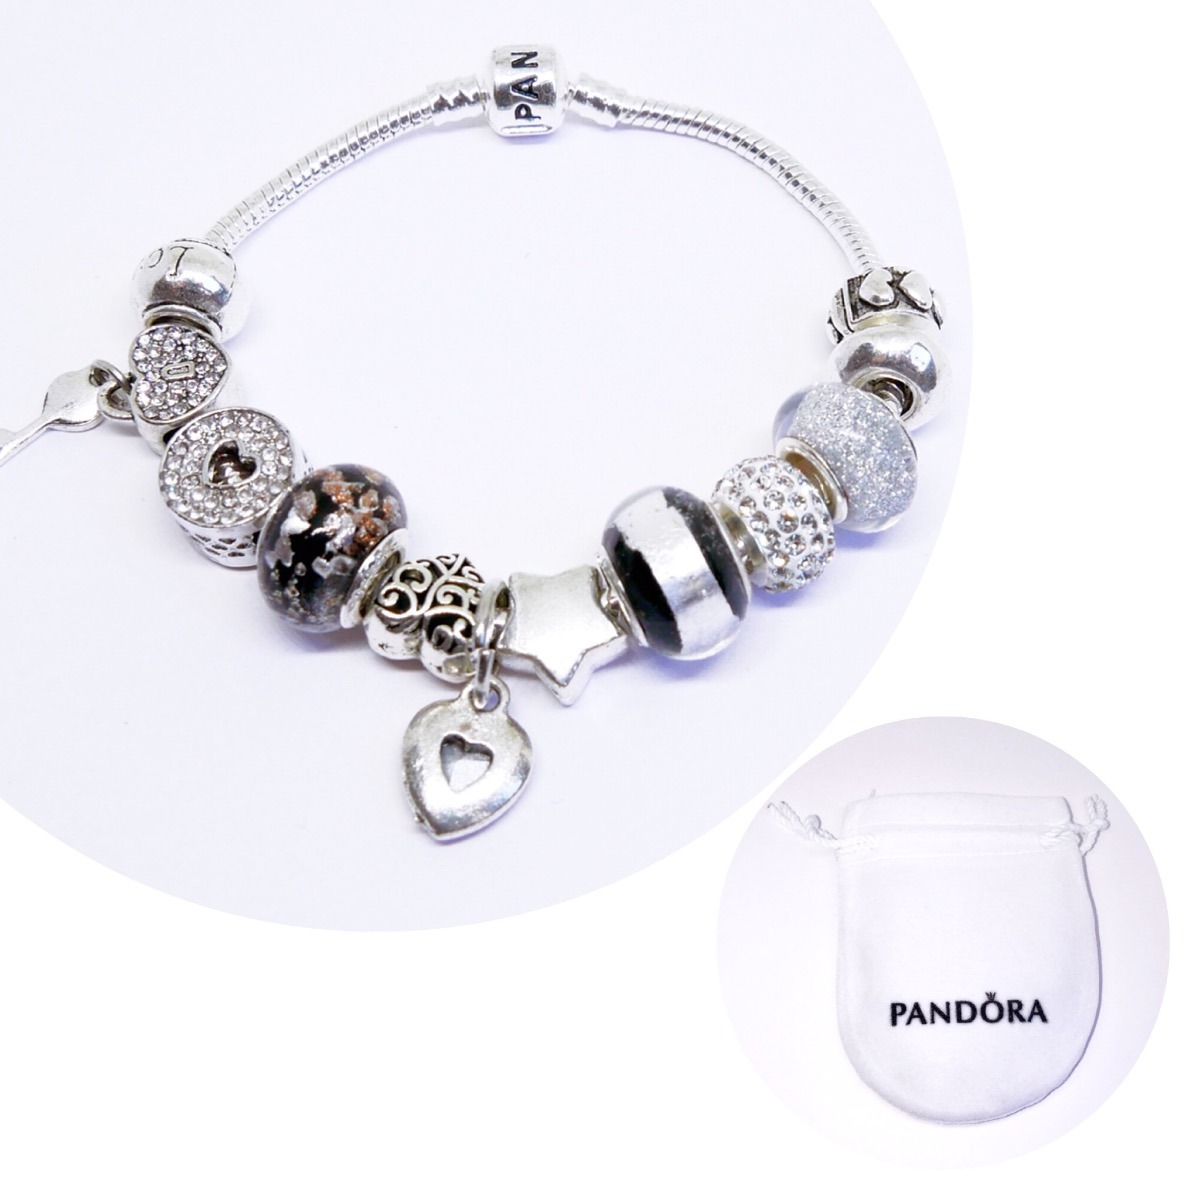 b157200ed Pulsera Pandora Charms Incluidos Baño Plata Regalo Mujer - $ 549.00 ...